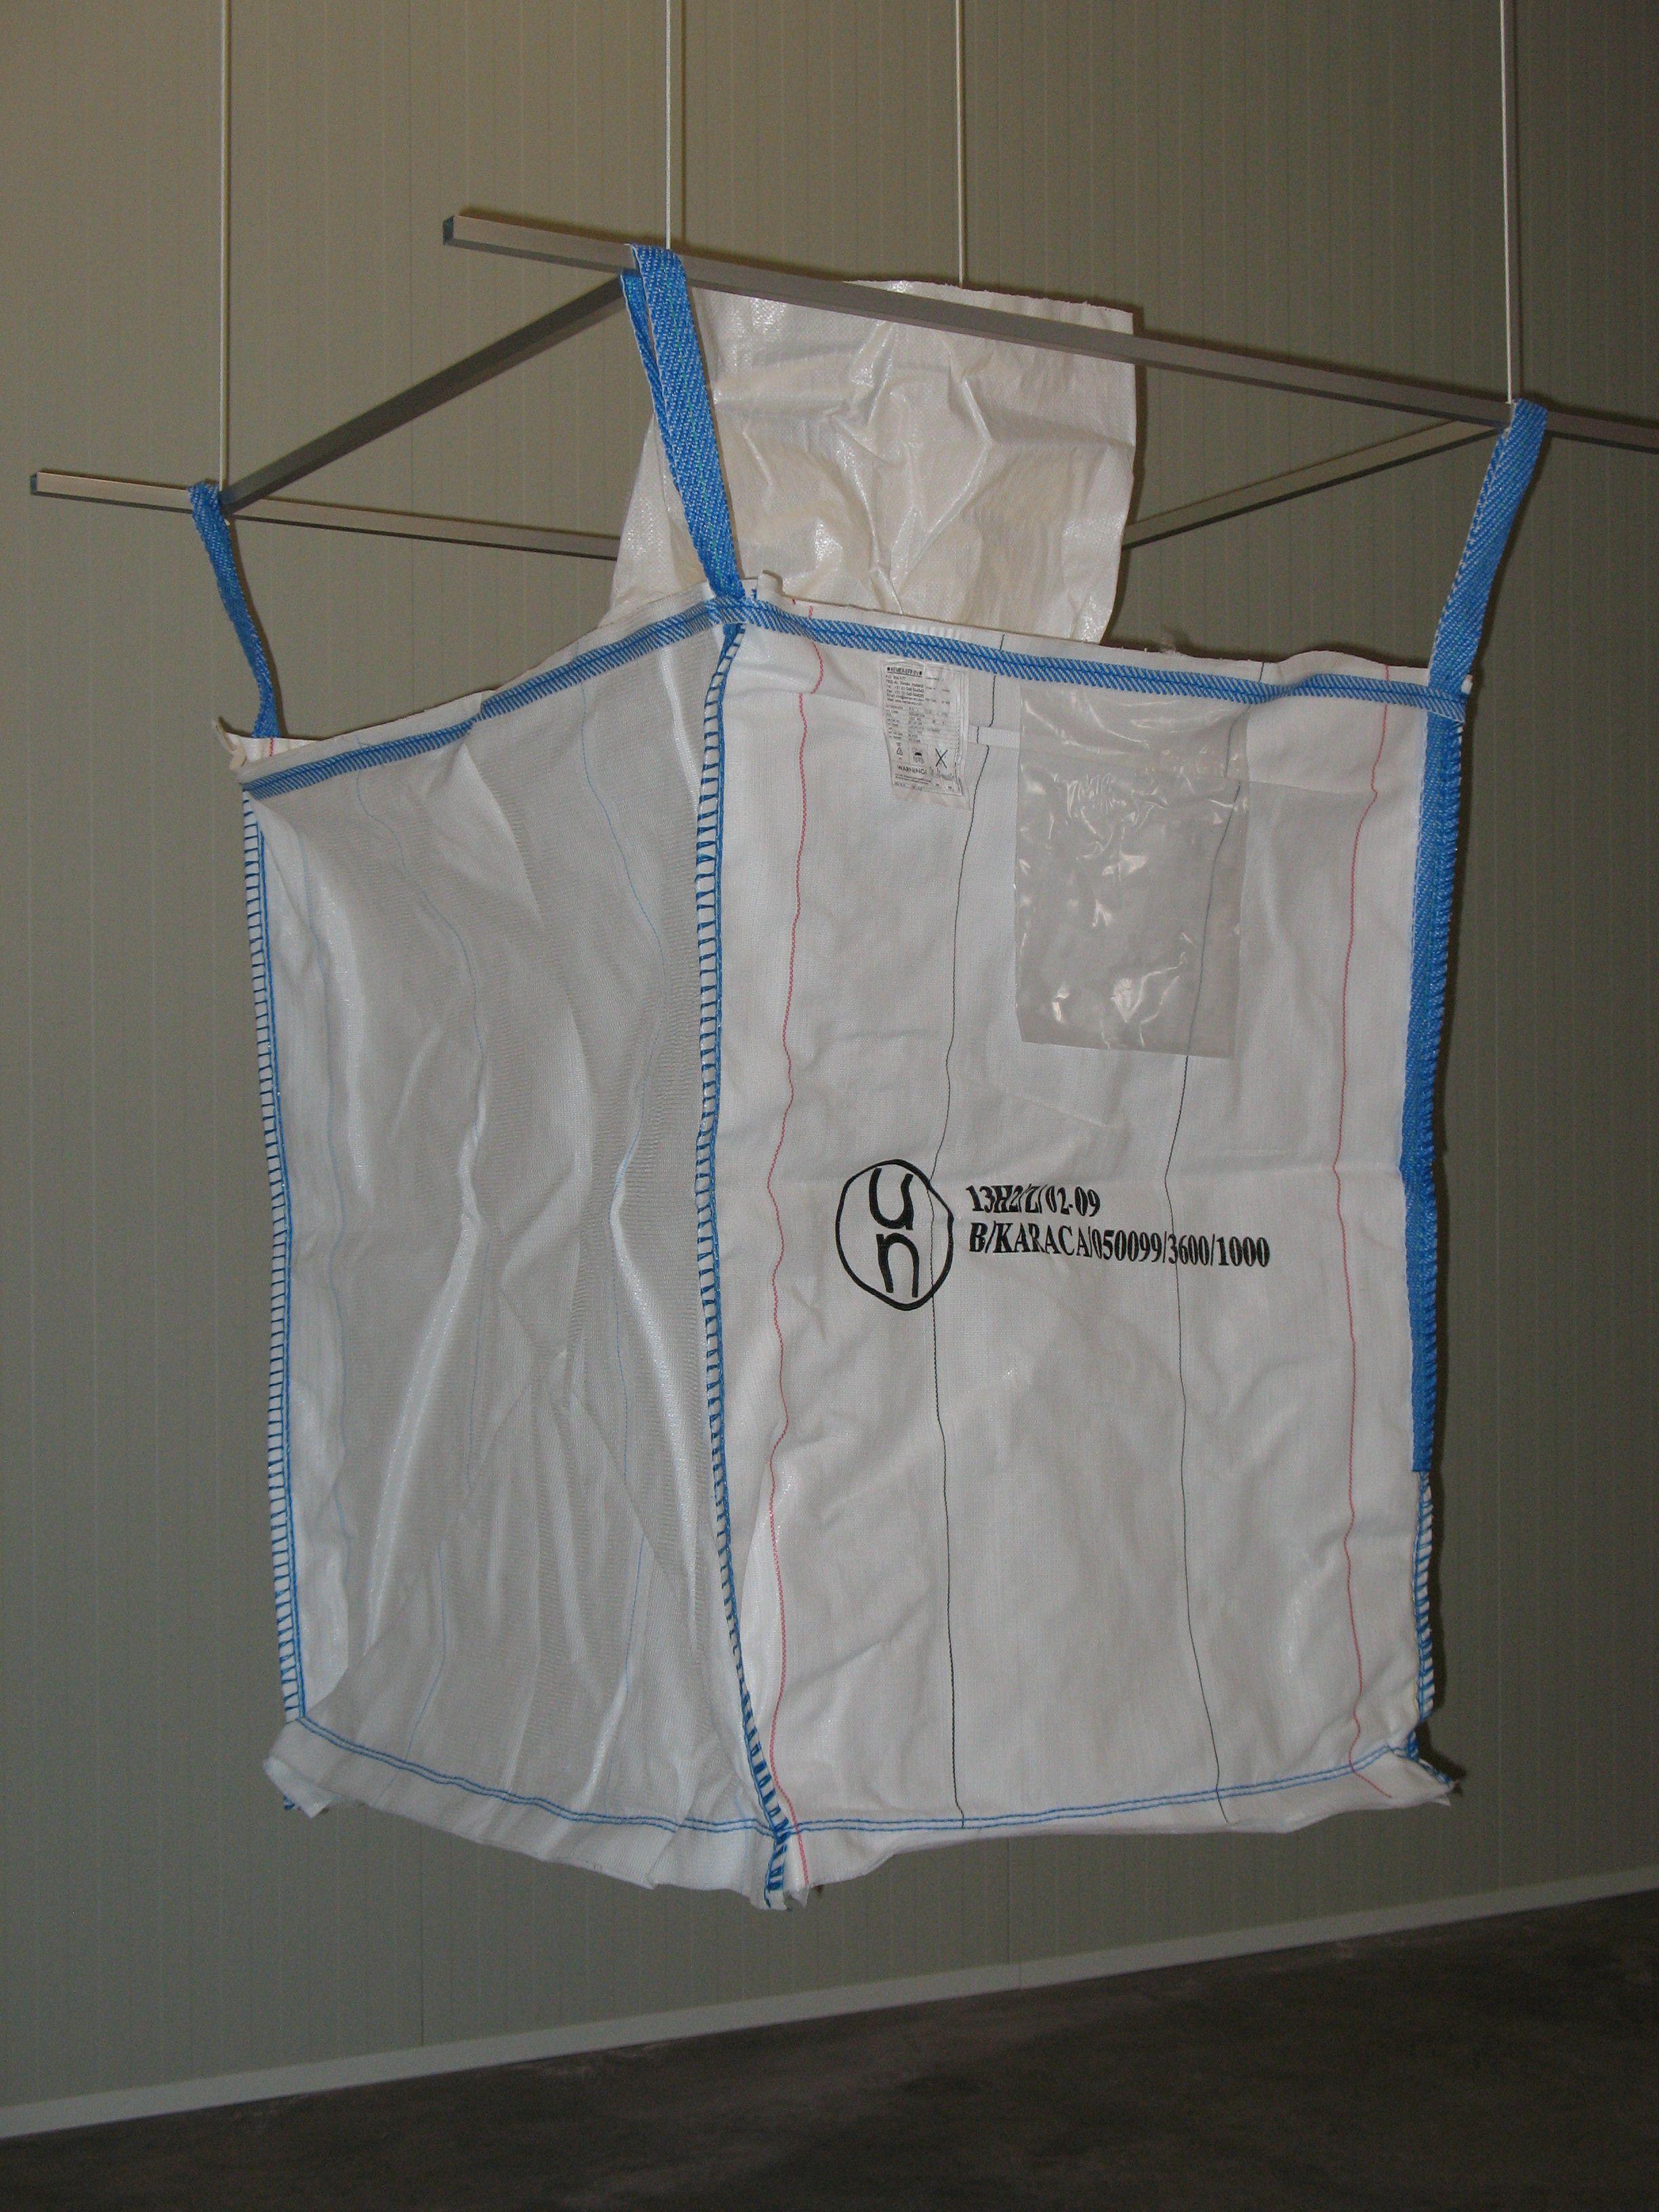 big bag afmetingen 91 x 110 x 115 cm un en adr gecertificeerd big bag online. Black Bedroom Furniture Sets. Home Design Ideas